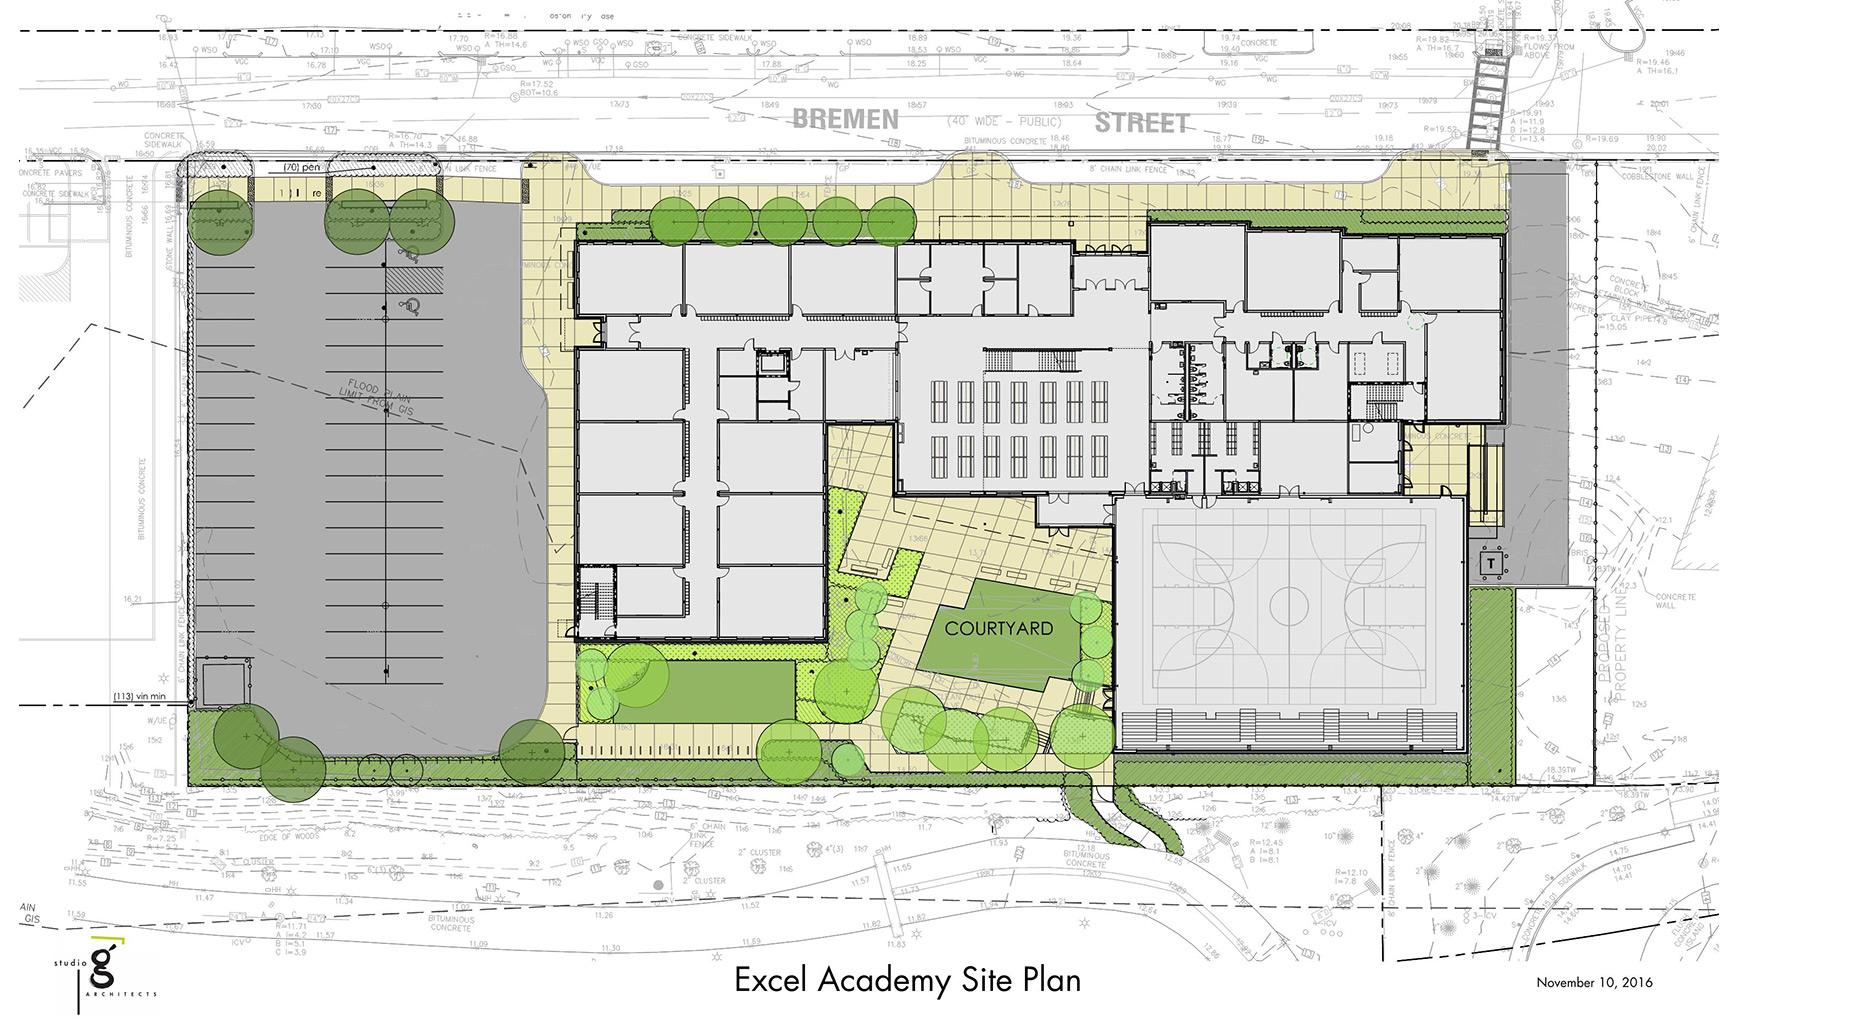 Site plan exle studio g architects learn portfolio excel for Free site plan